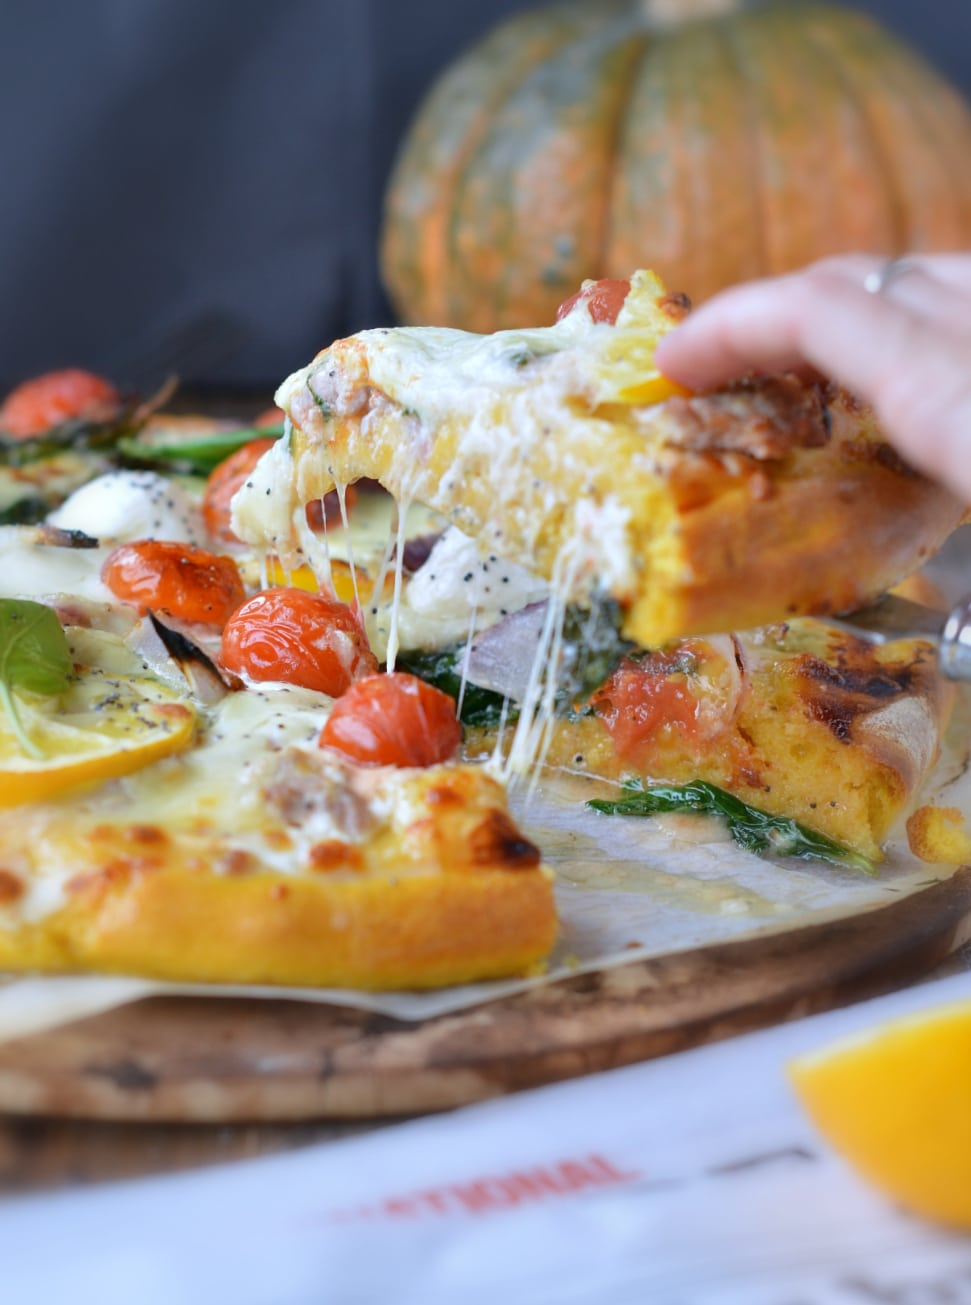 CHESSY PUMPKIN PIZZA